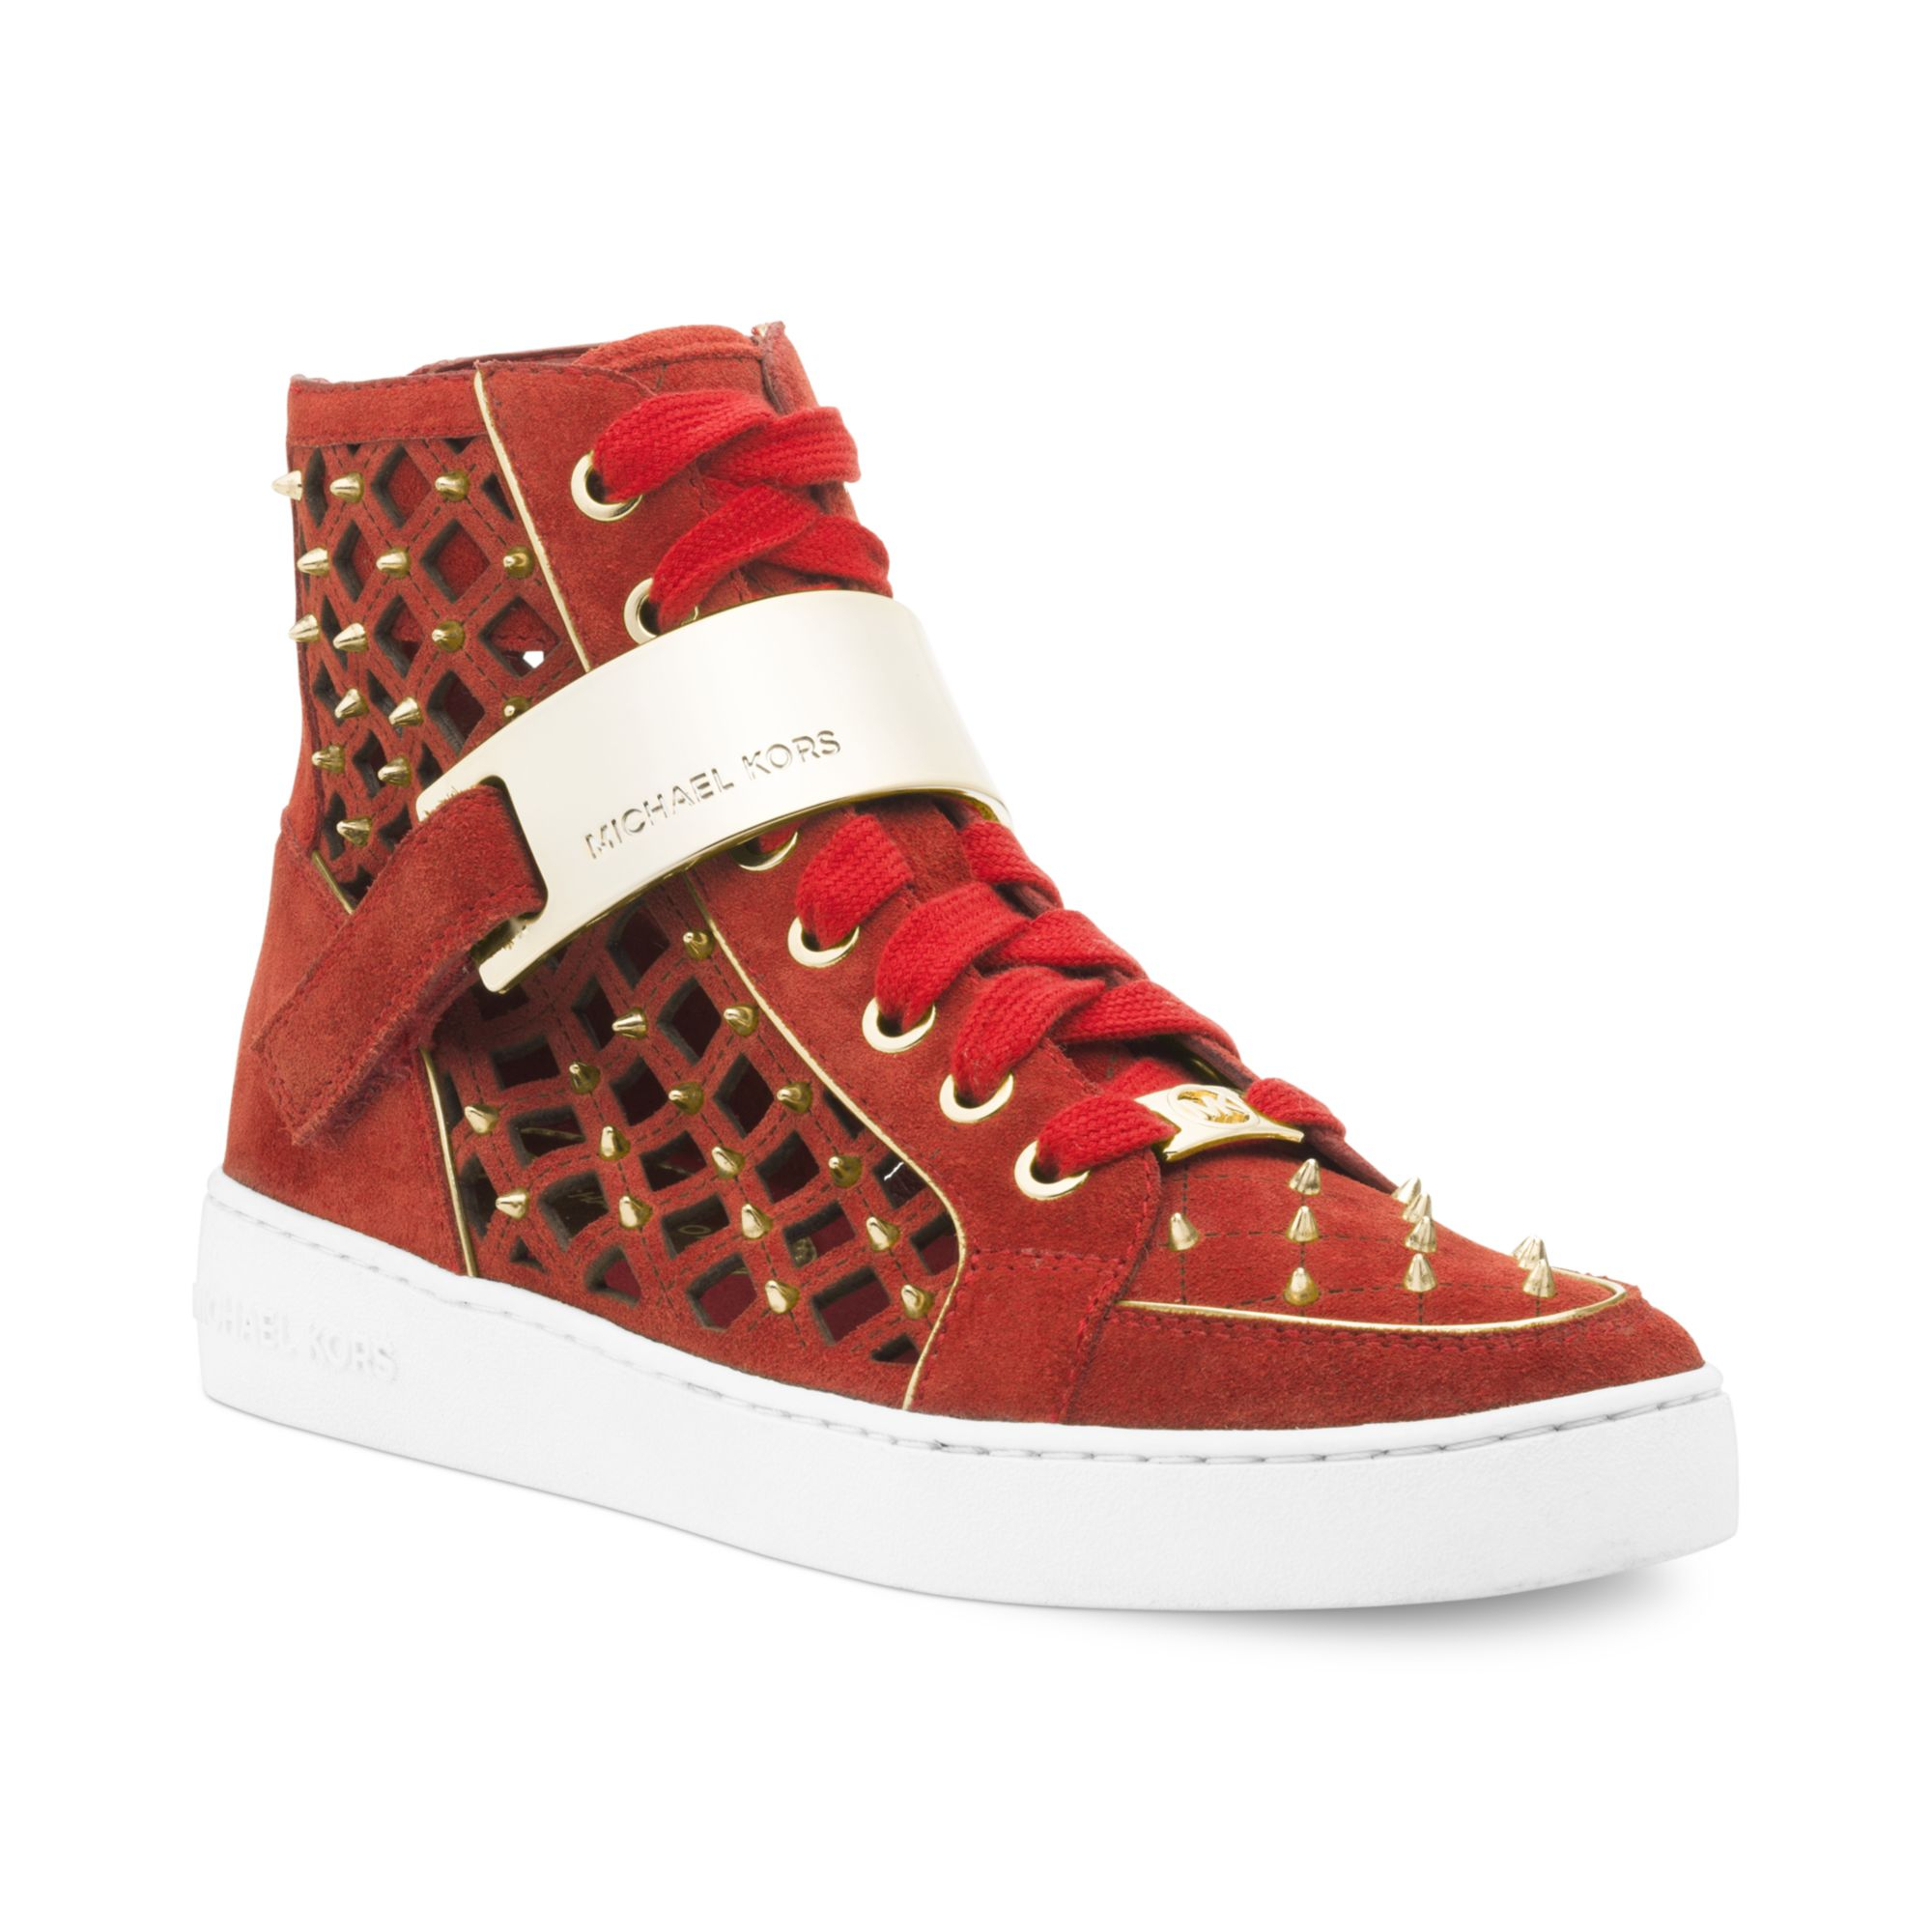 michael kors michael keaton high top sneakers in red lyst. Black Bedroom Furniture Sets. Home Design Ideas